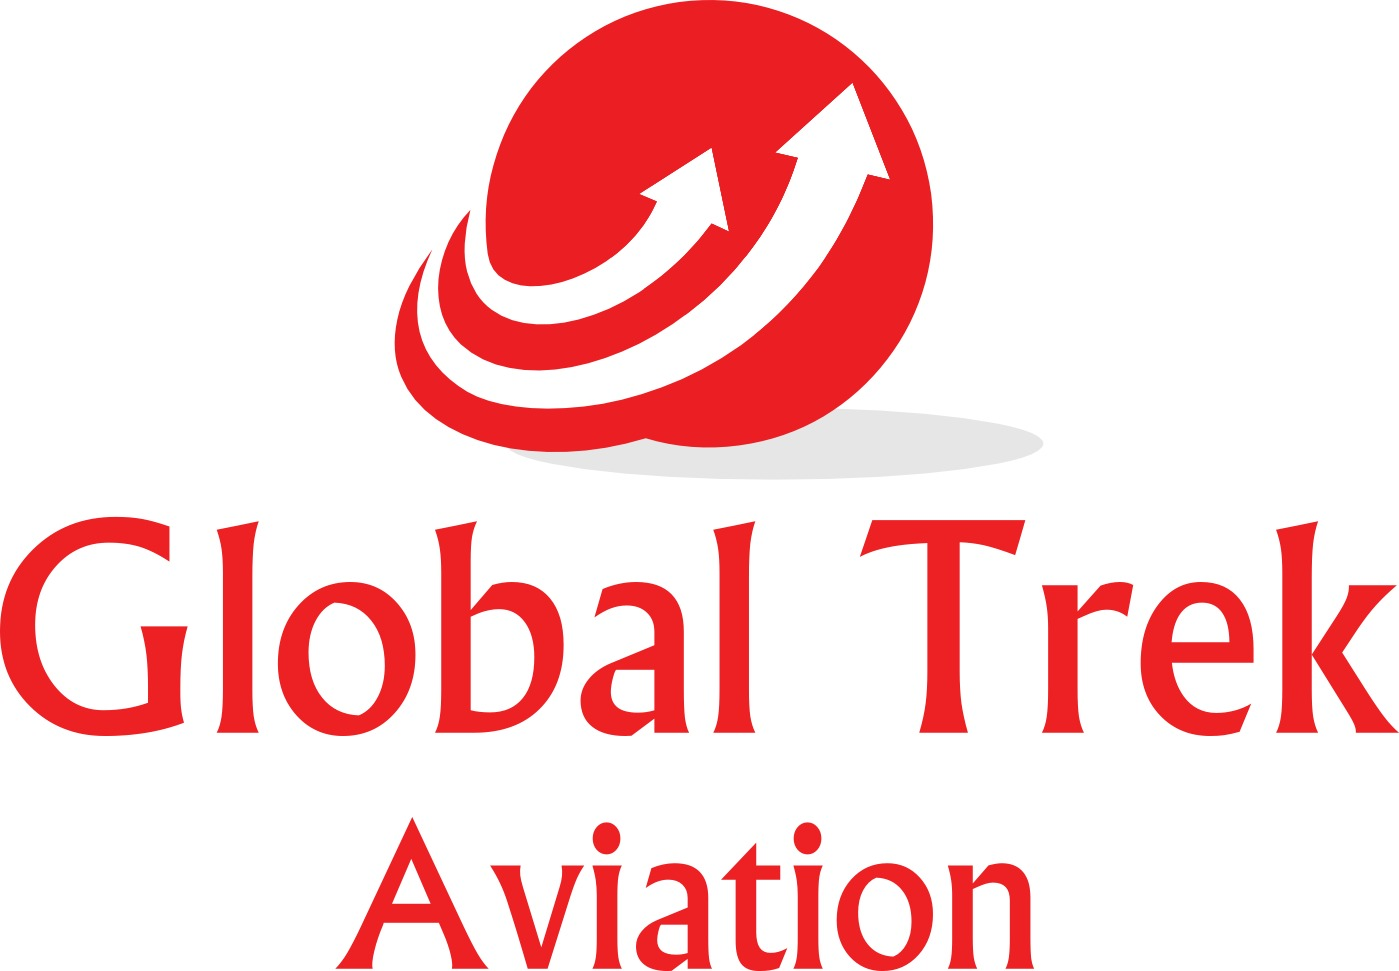 GlobalTrekAviation logojpg